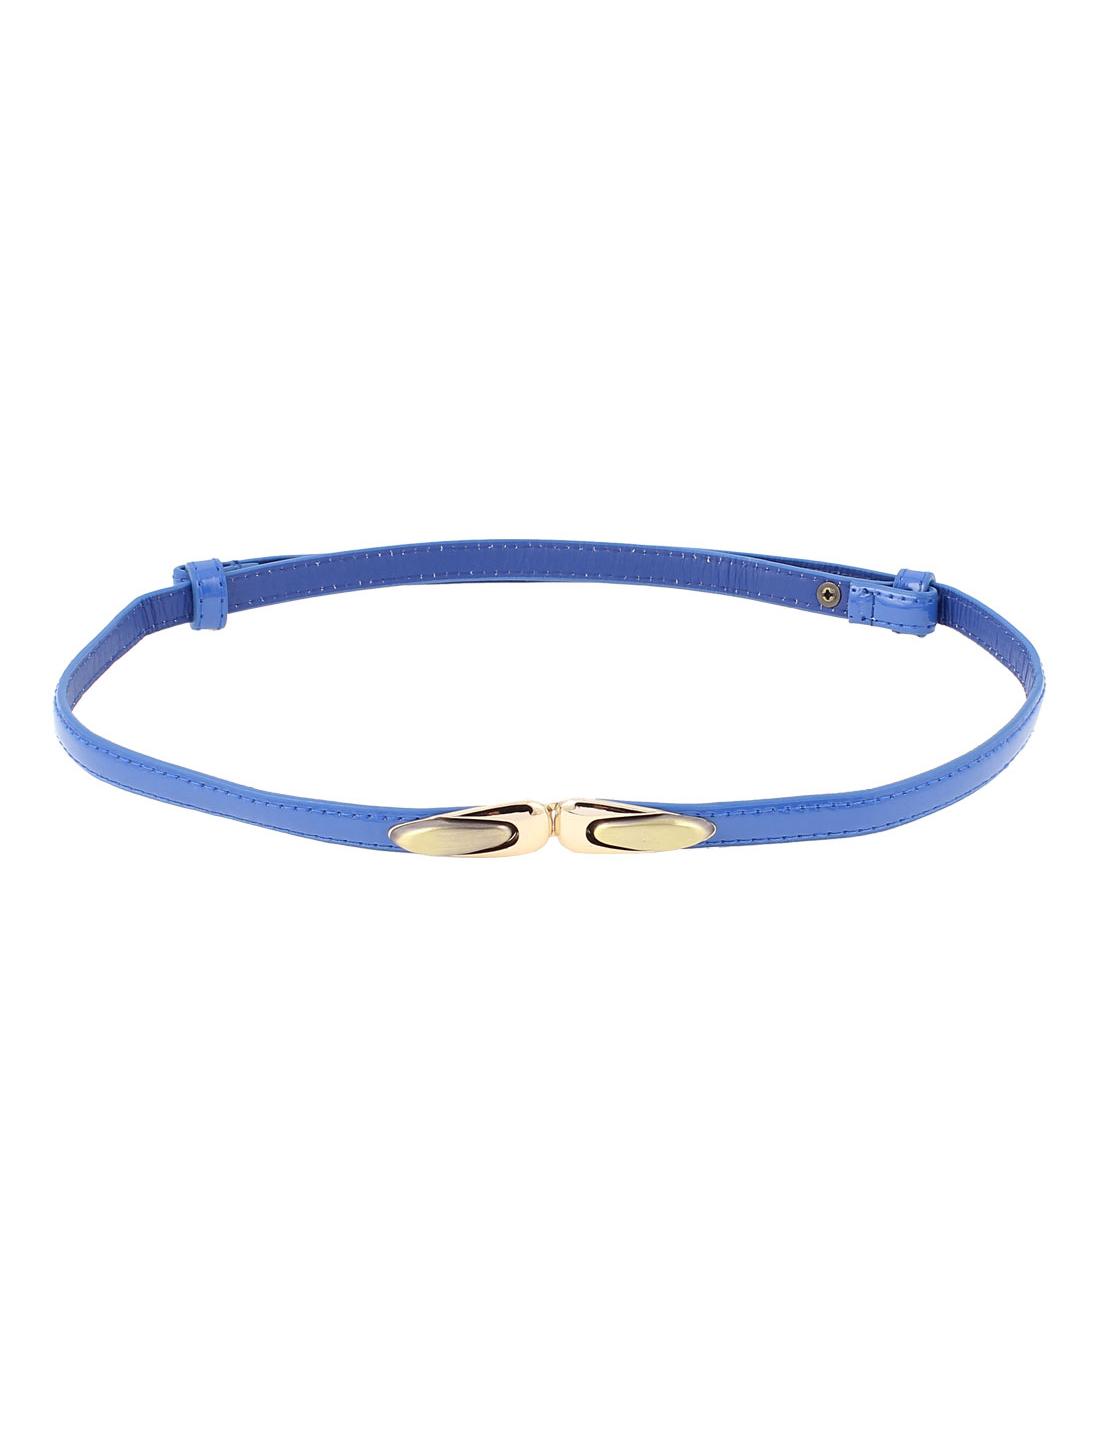 Women Slim Metal Buckle Adjustable Skinny Waist Belt Waistband Blue